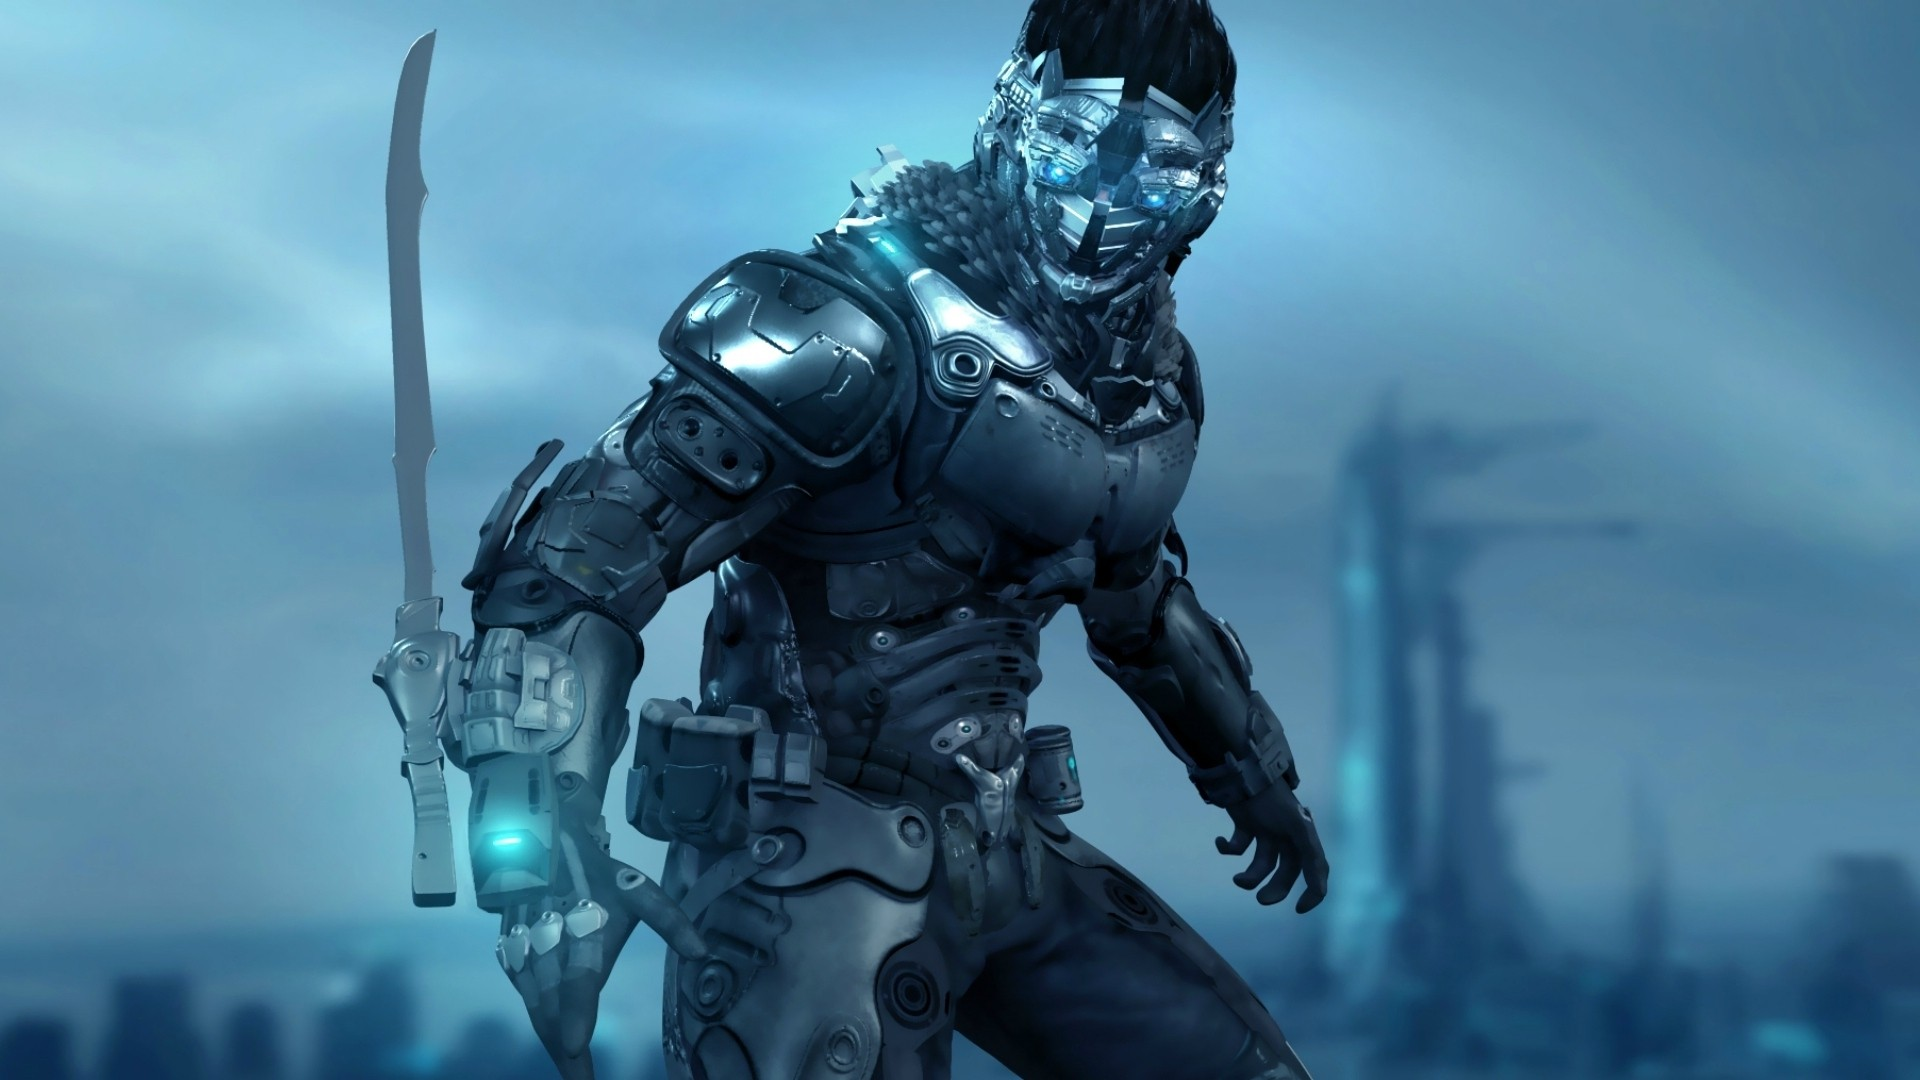 Cyborg Wallpaper Download